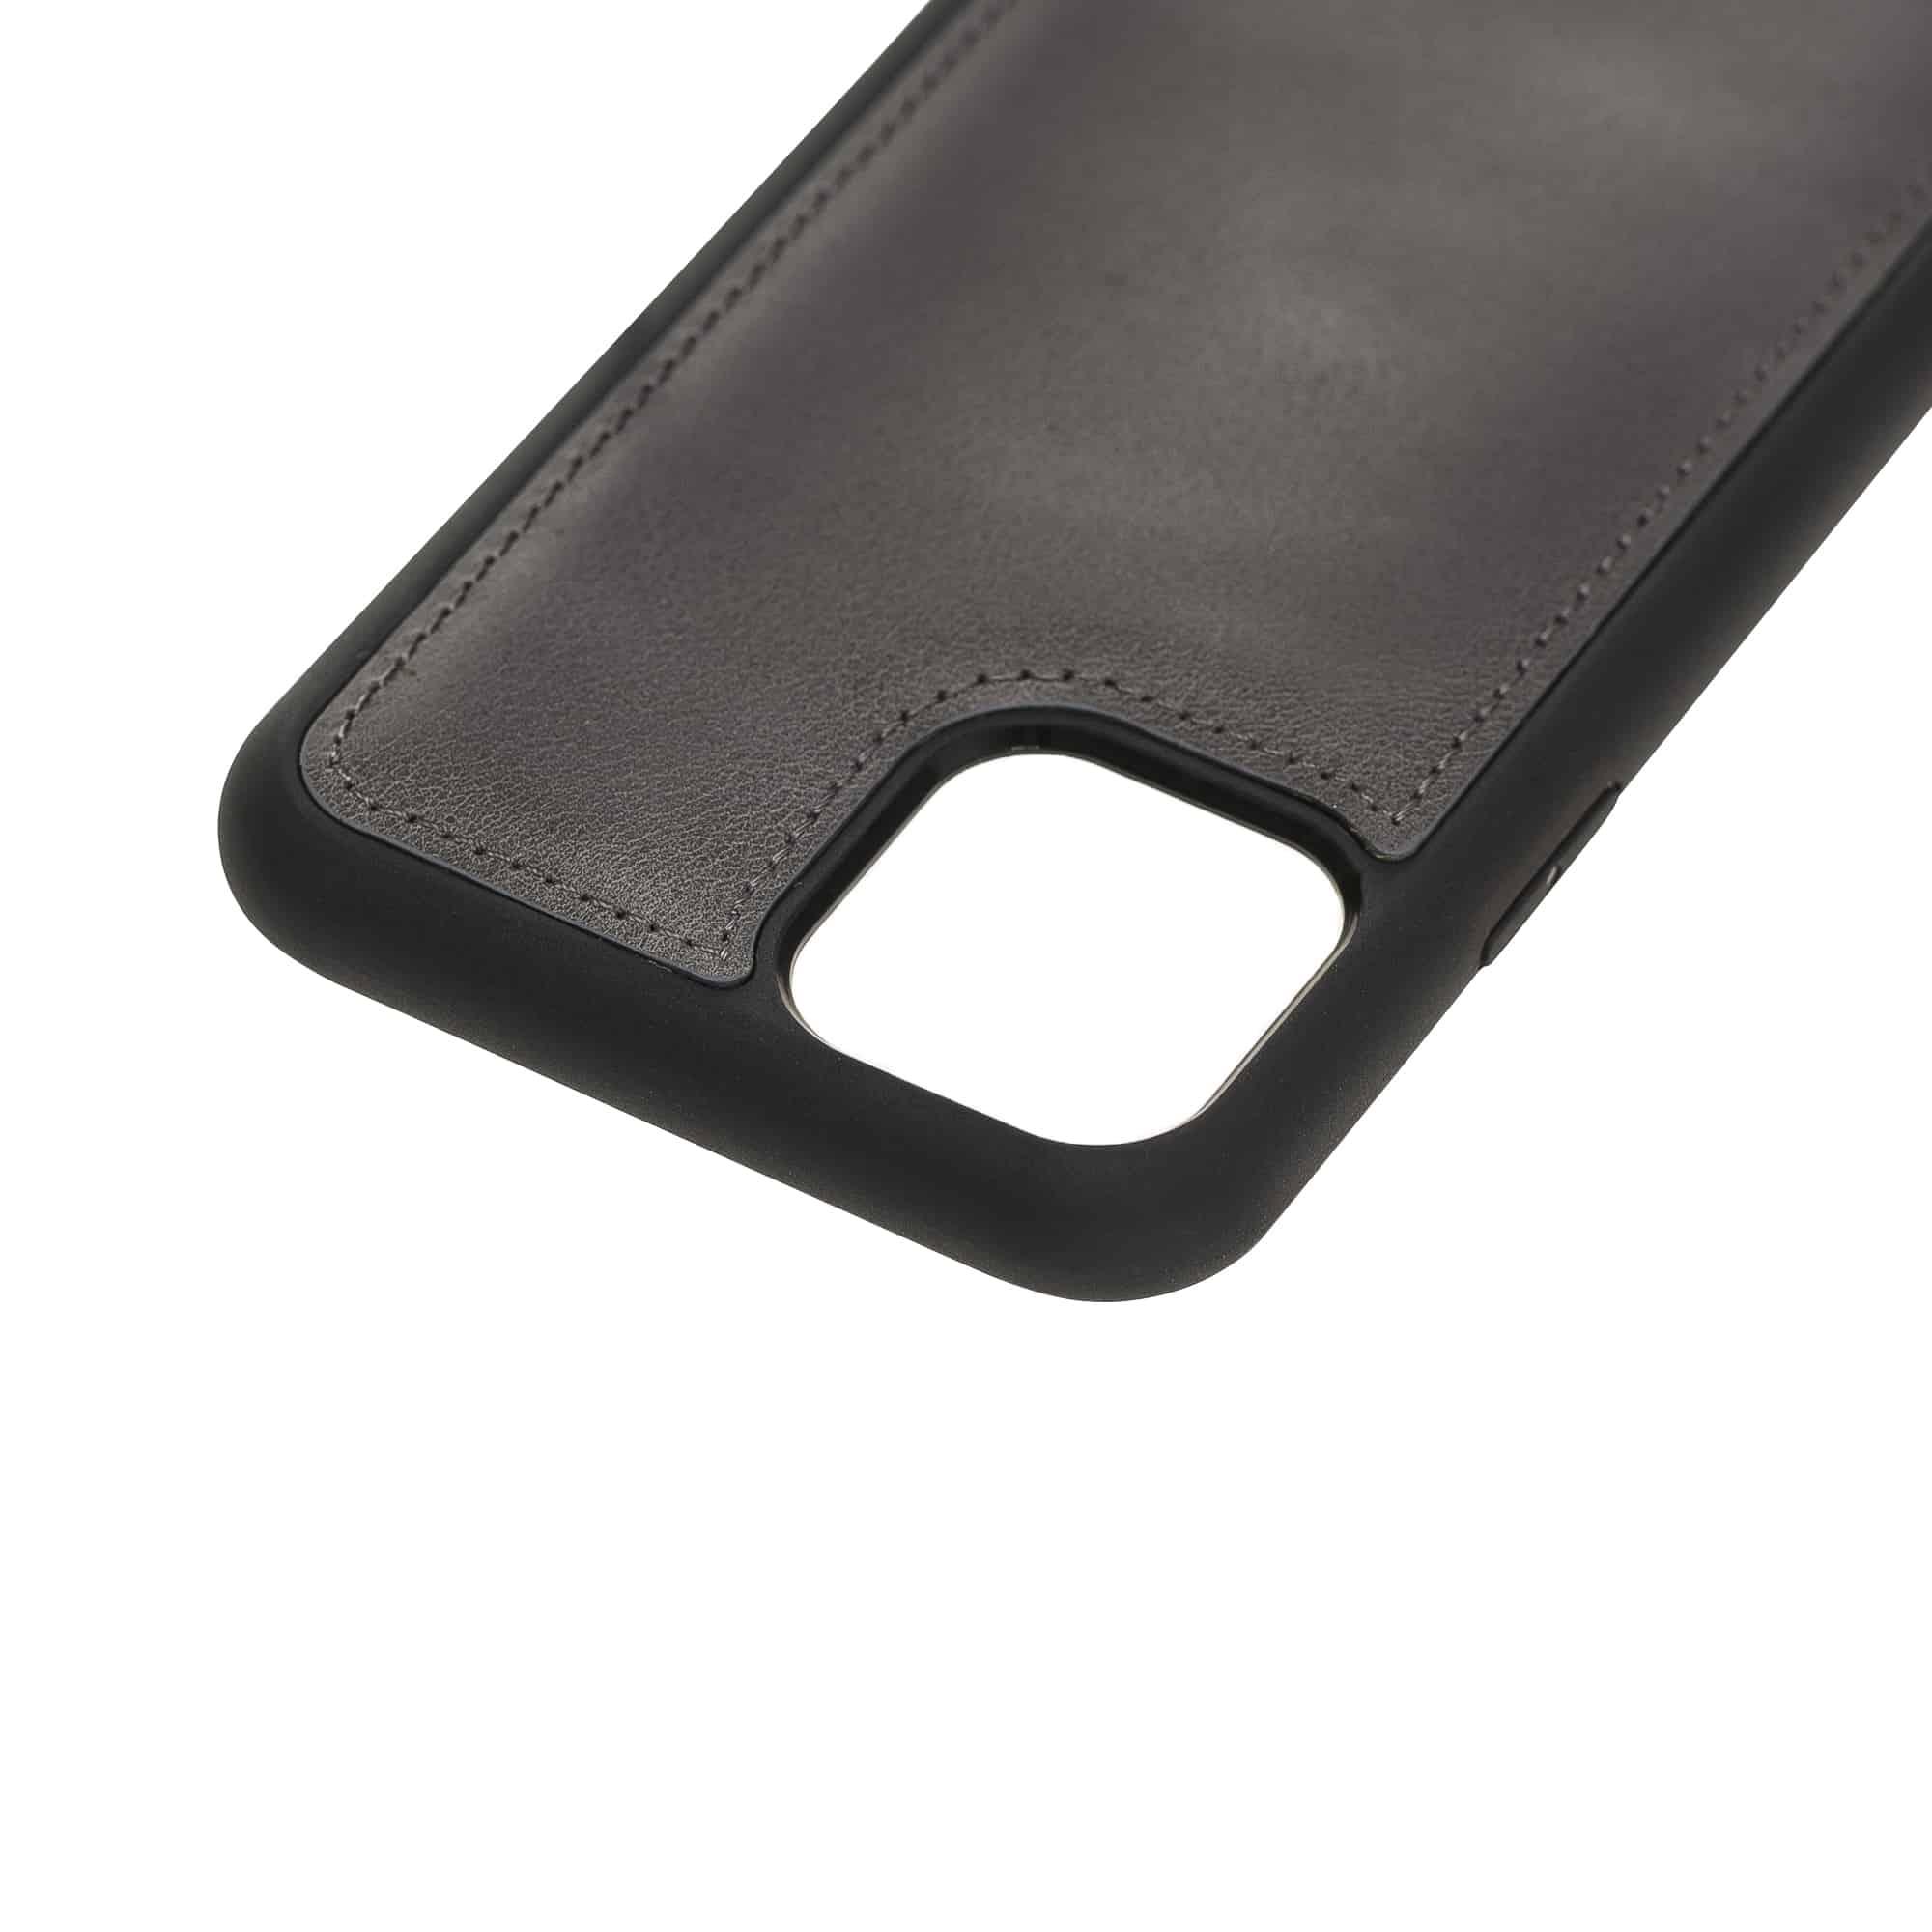 Solo Pelle Lederhülle für das iPhone 11 Pro in 5.8 Zoll Stanford Case Leder Hülle Ledertasche Backcover aus echtem Leder (Steingrau Burned)